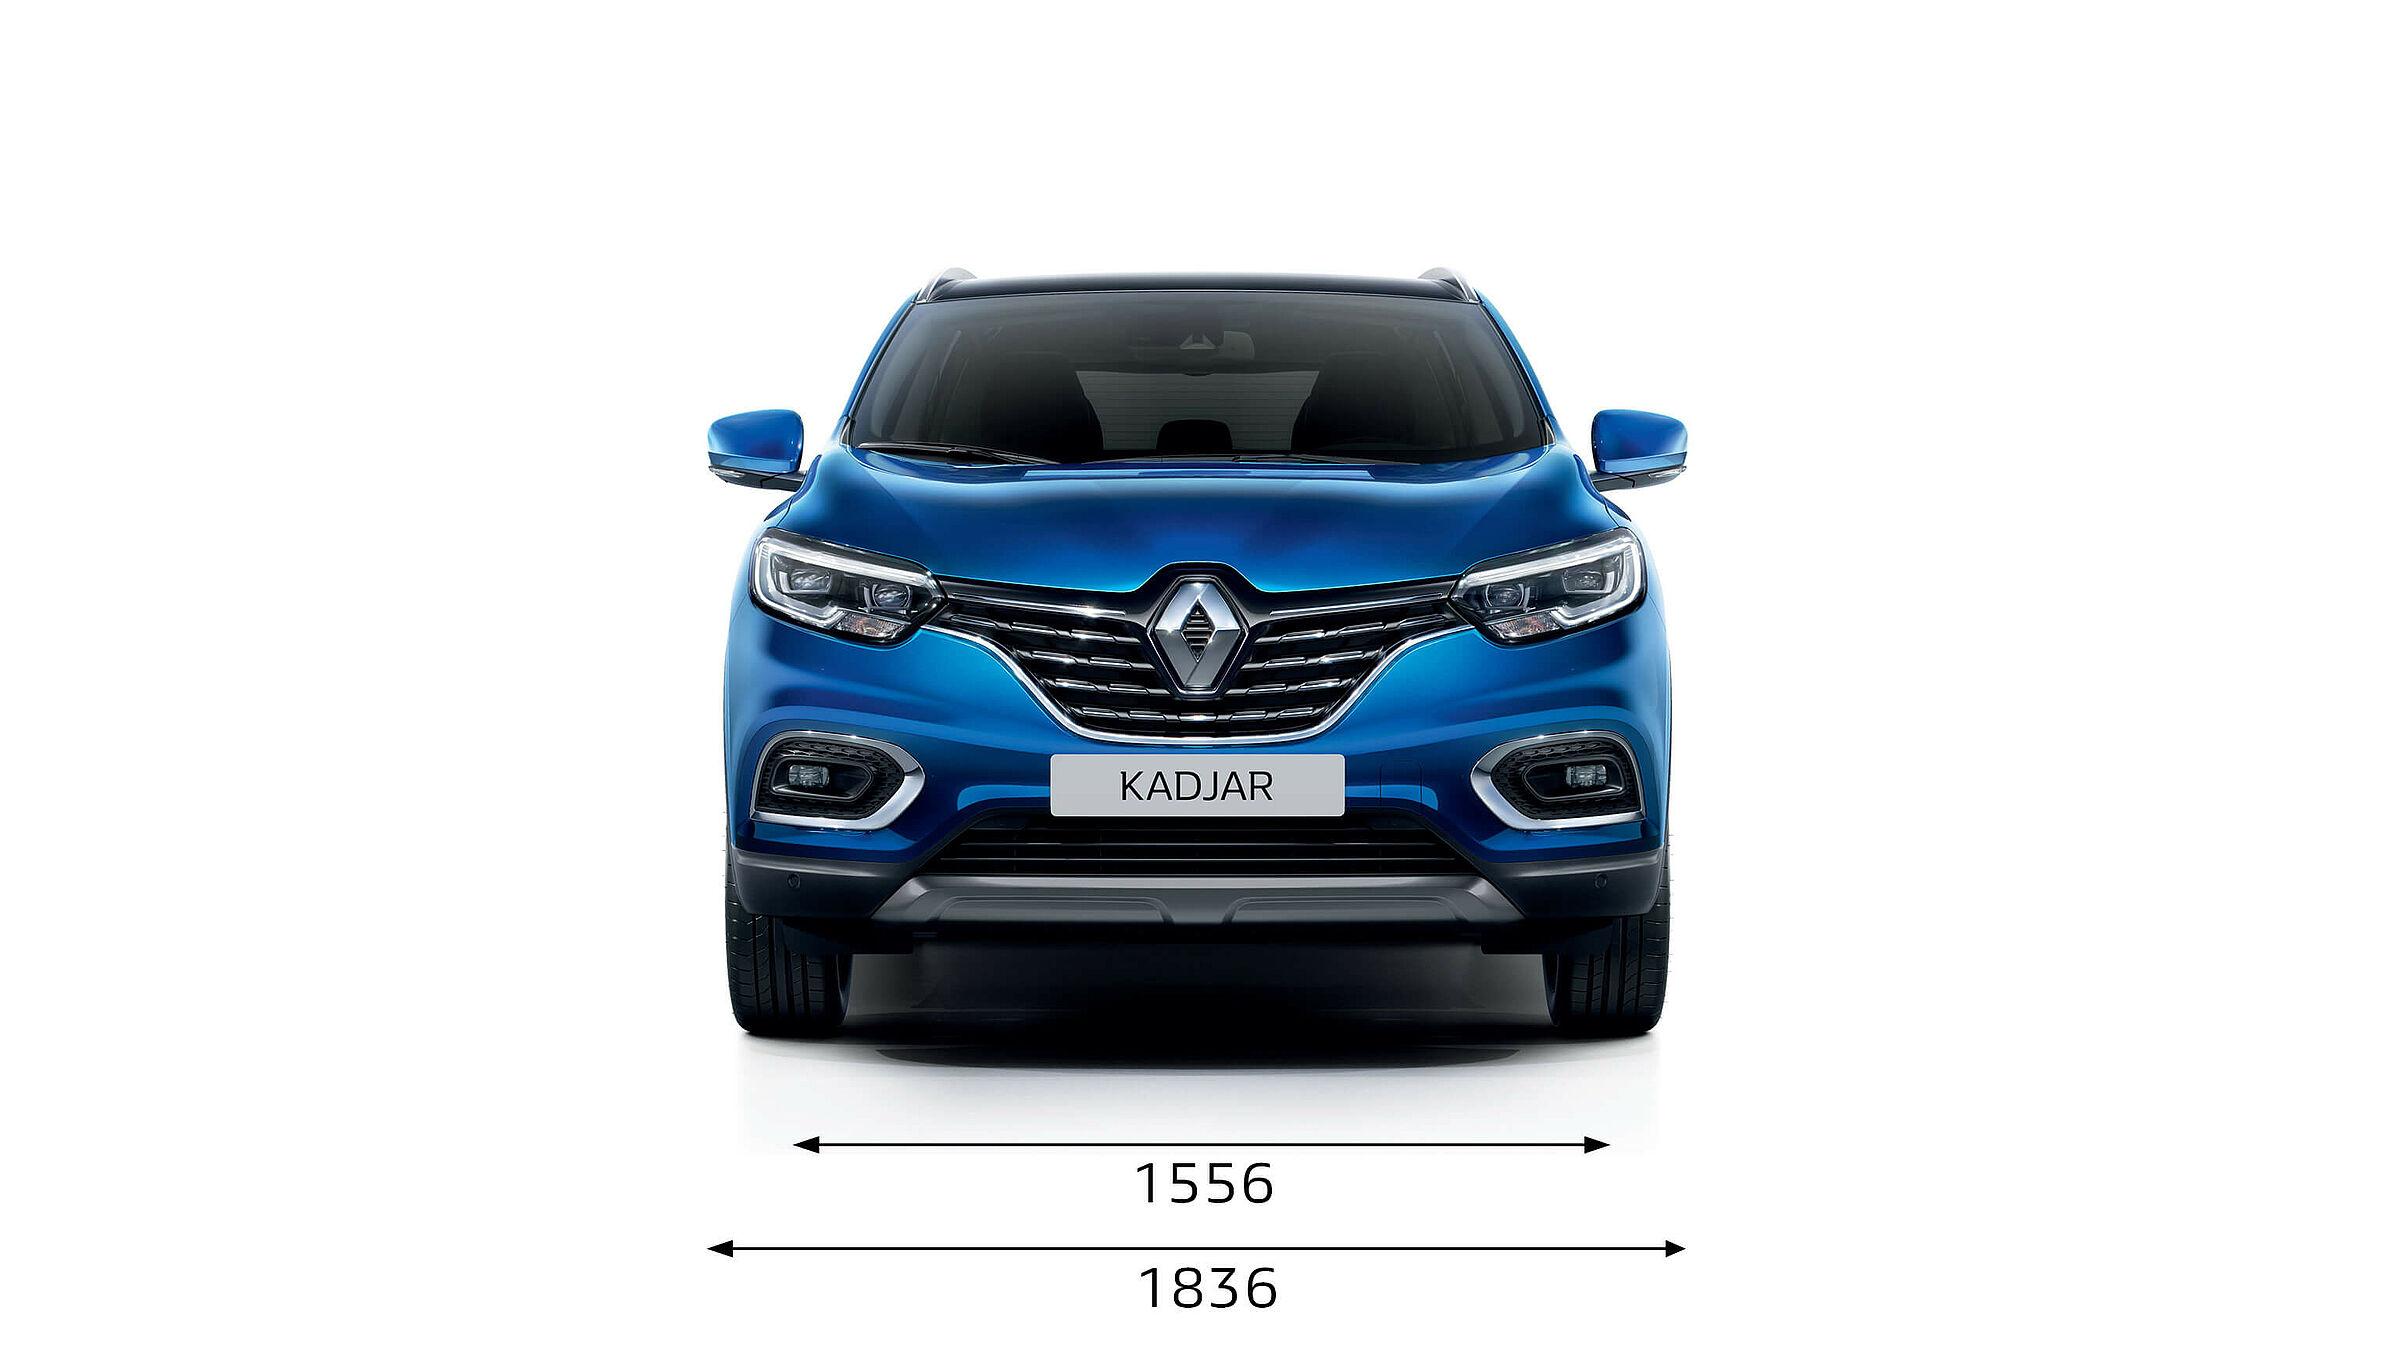 Renault Kadjar Autozentren P&A-Preckel